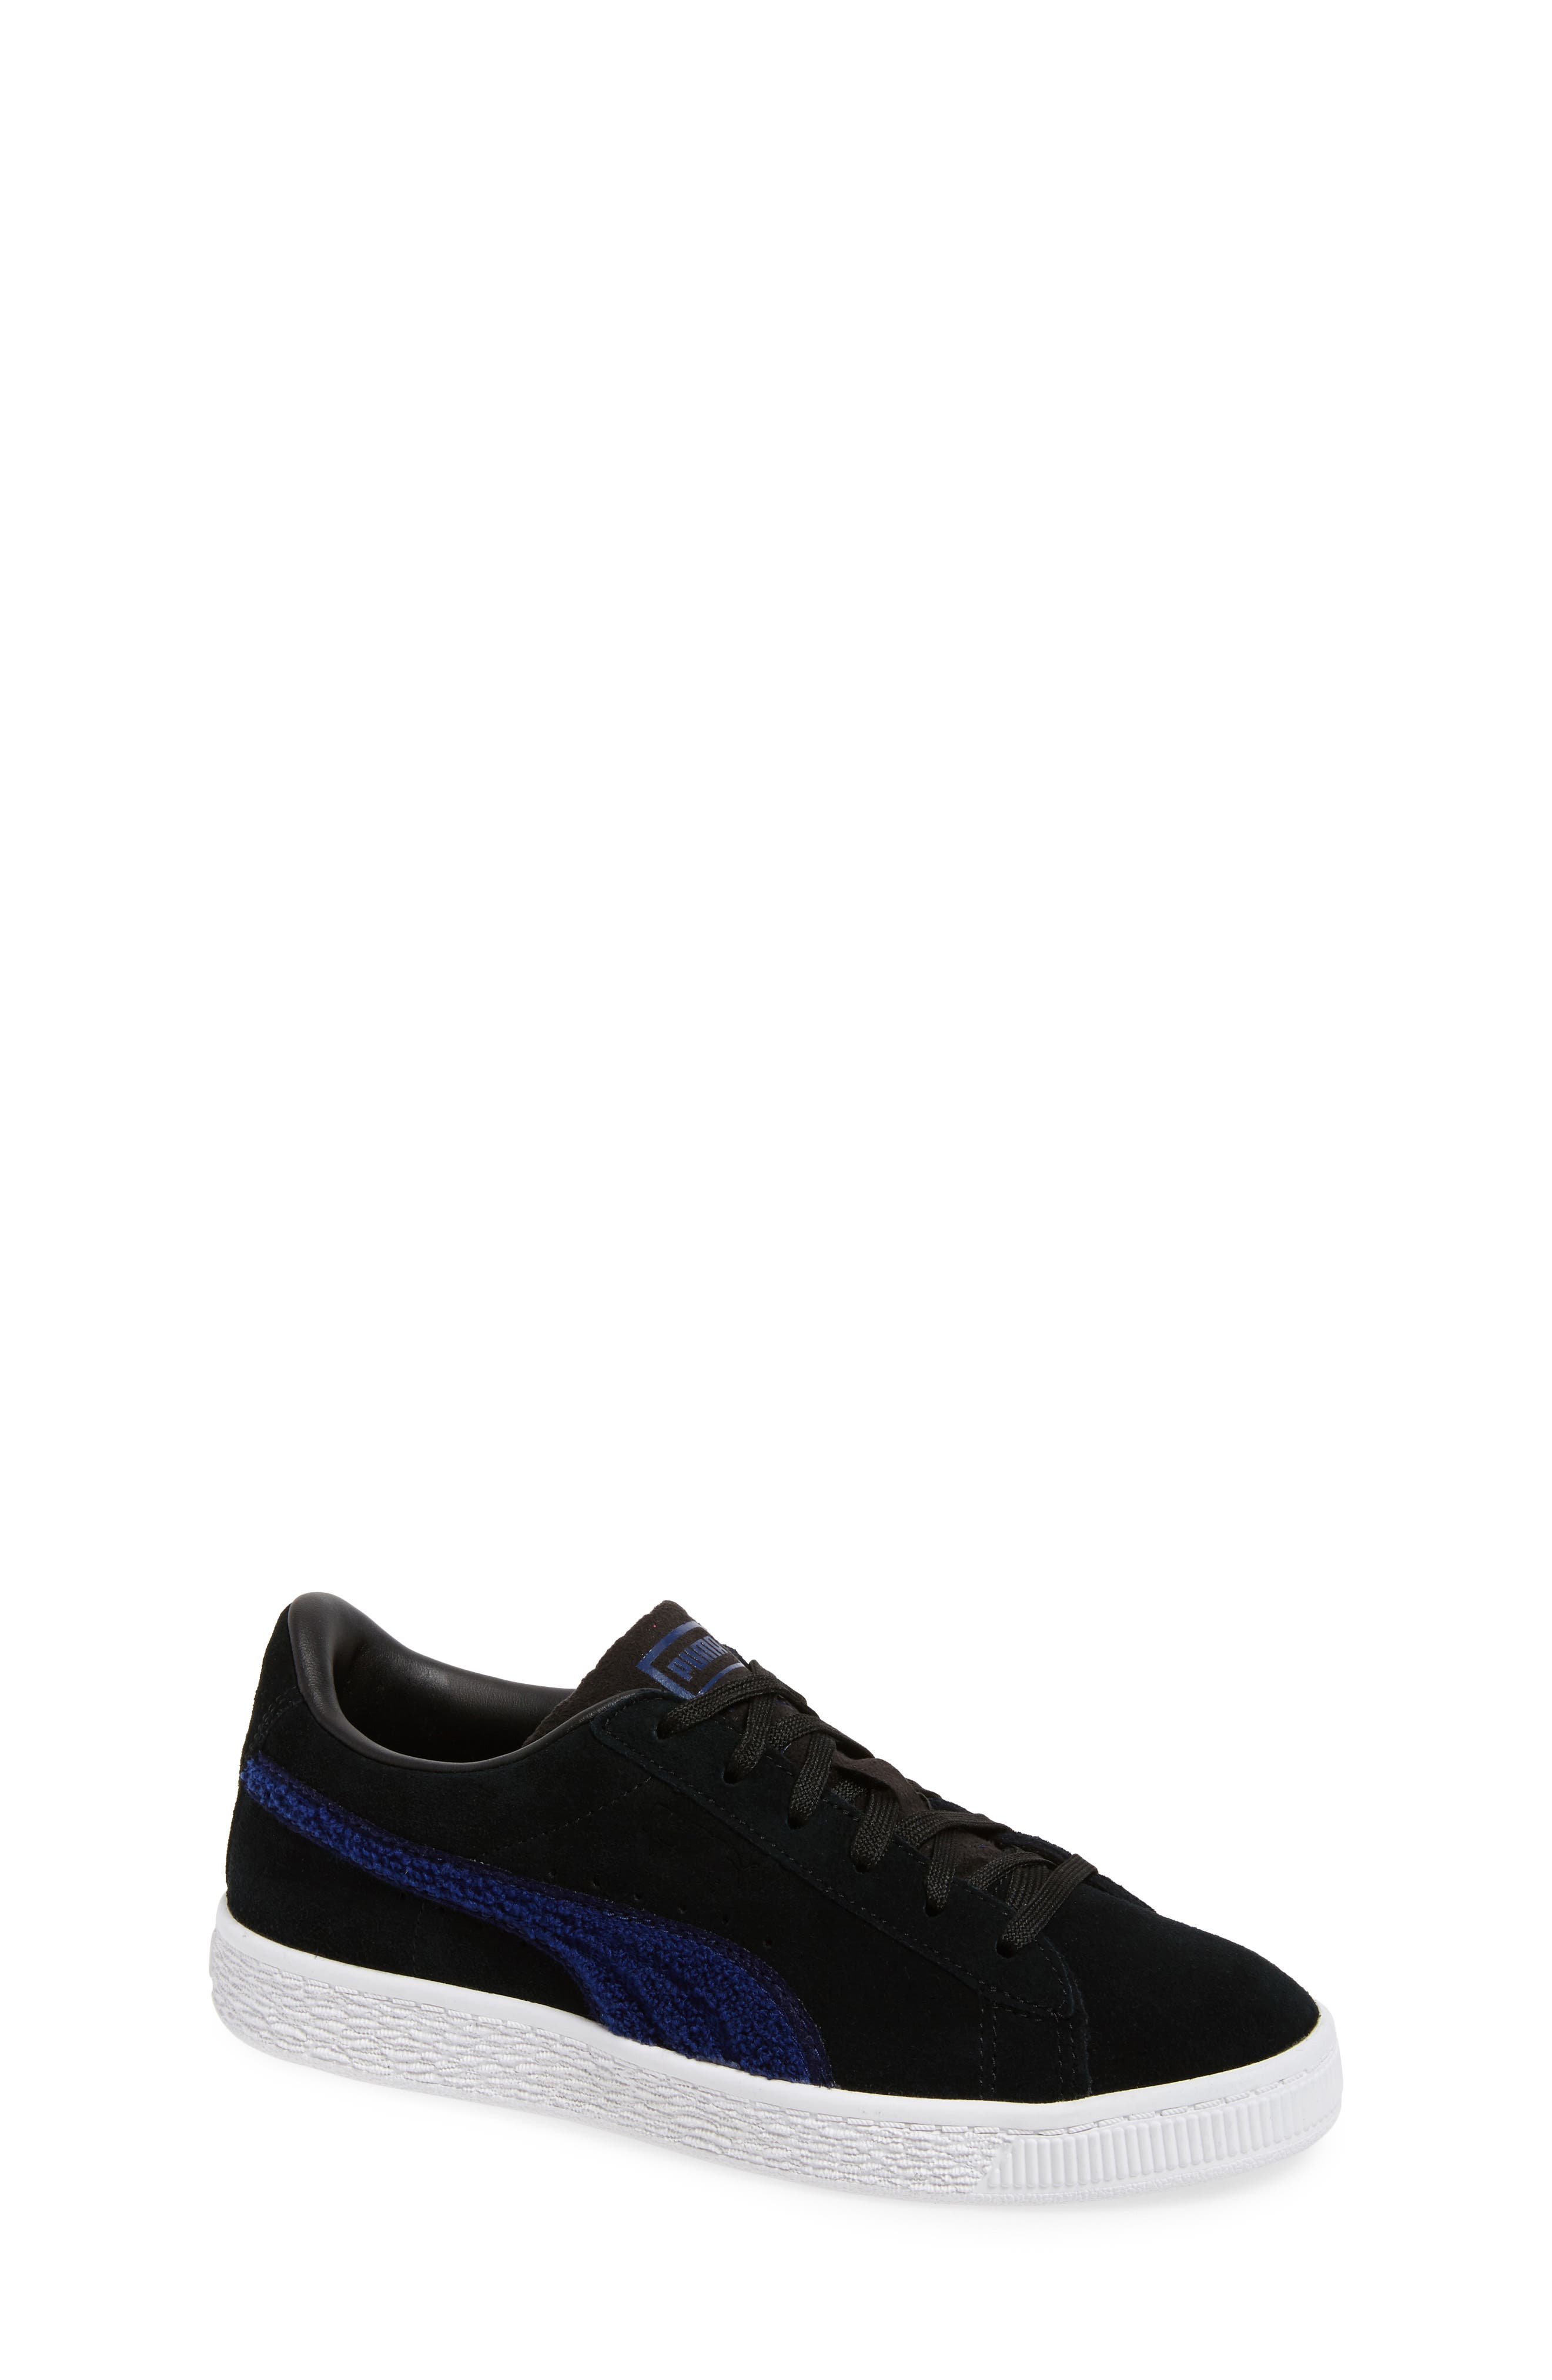 Alternate Image 1 Selected - PUMA Classic Terry Sneaker (Toddler, Little Kid & Big Kid)